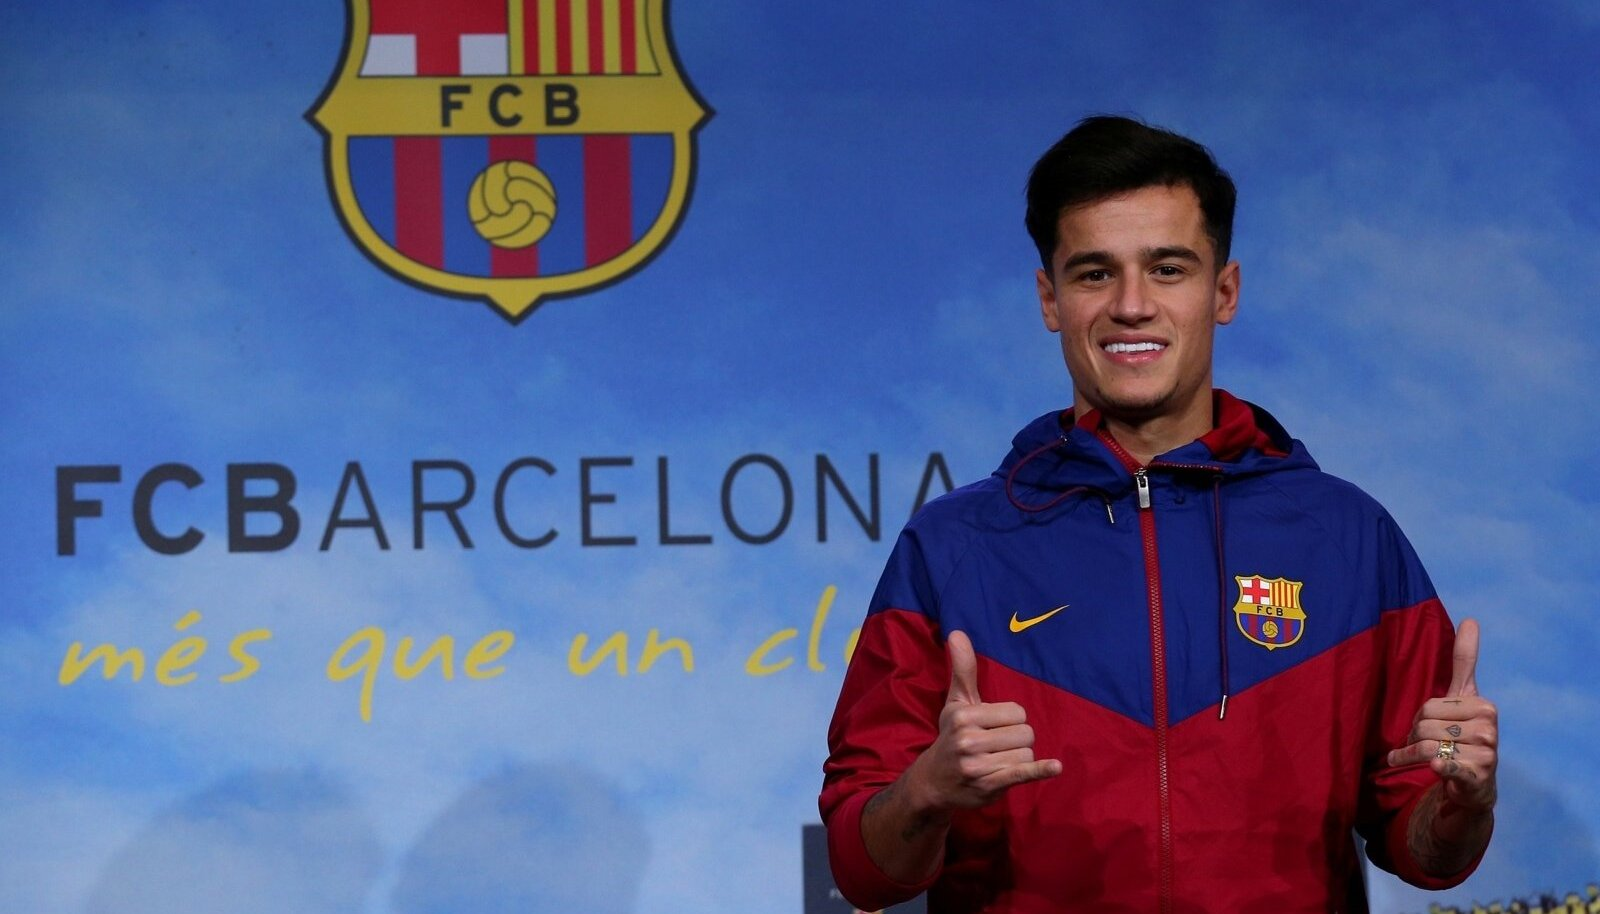 Philippe Coutinho FC Barcelona värvides.